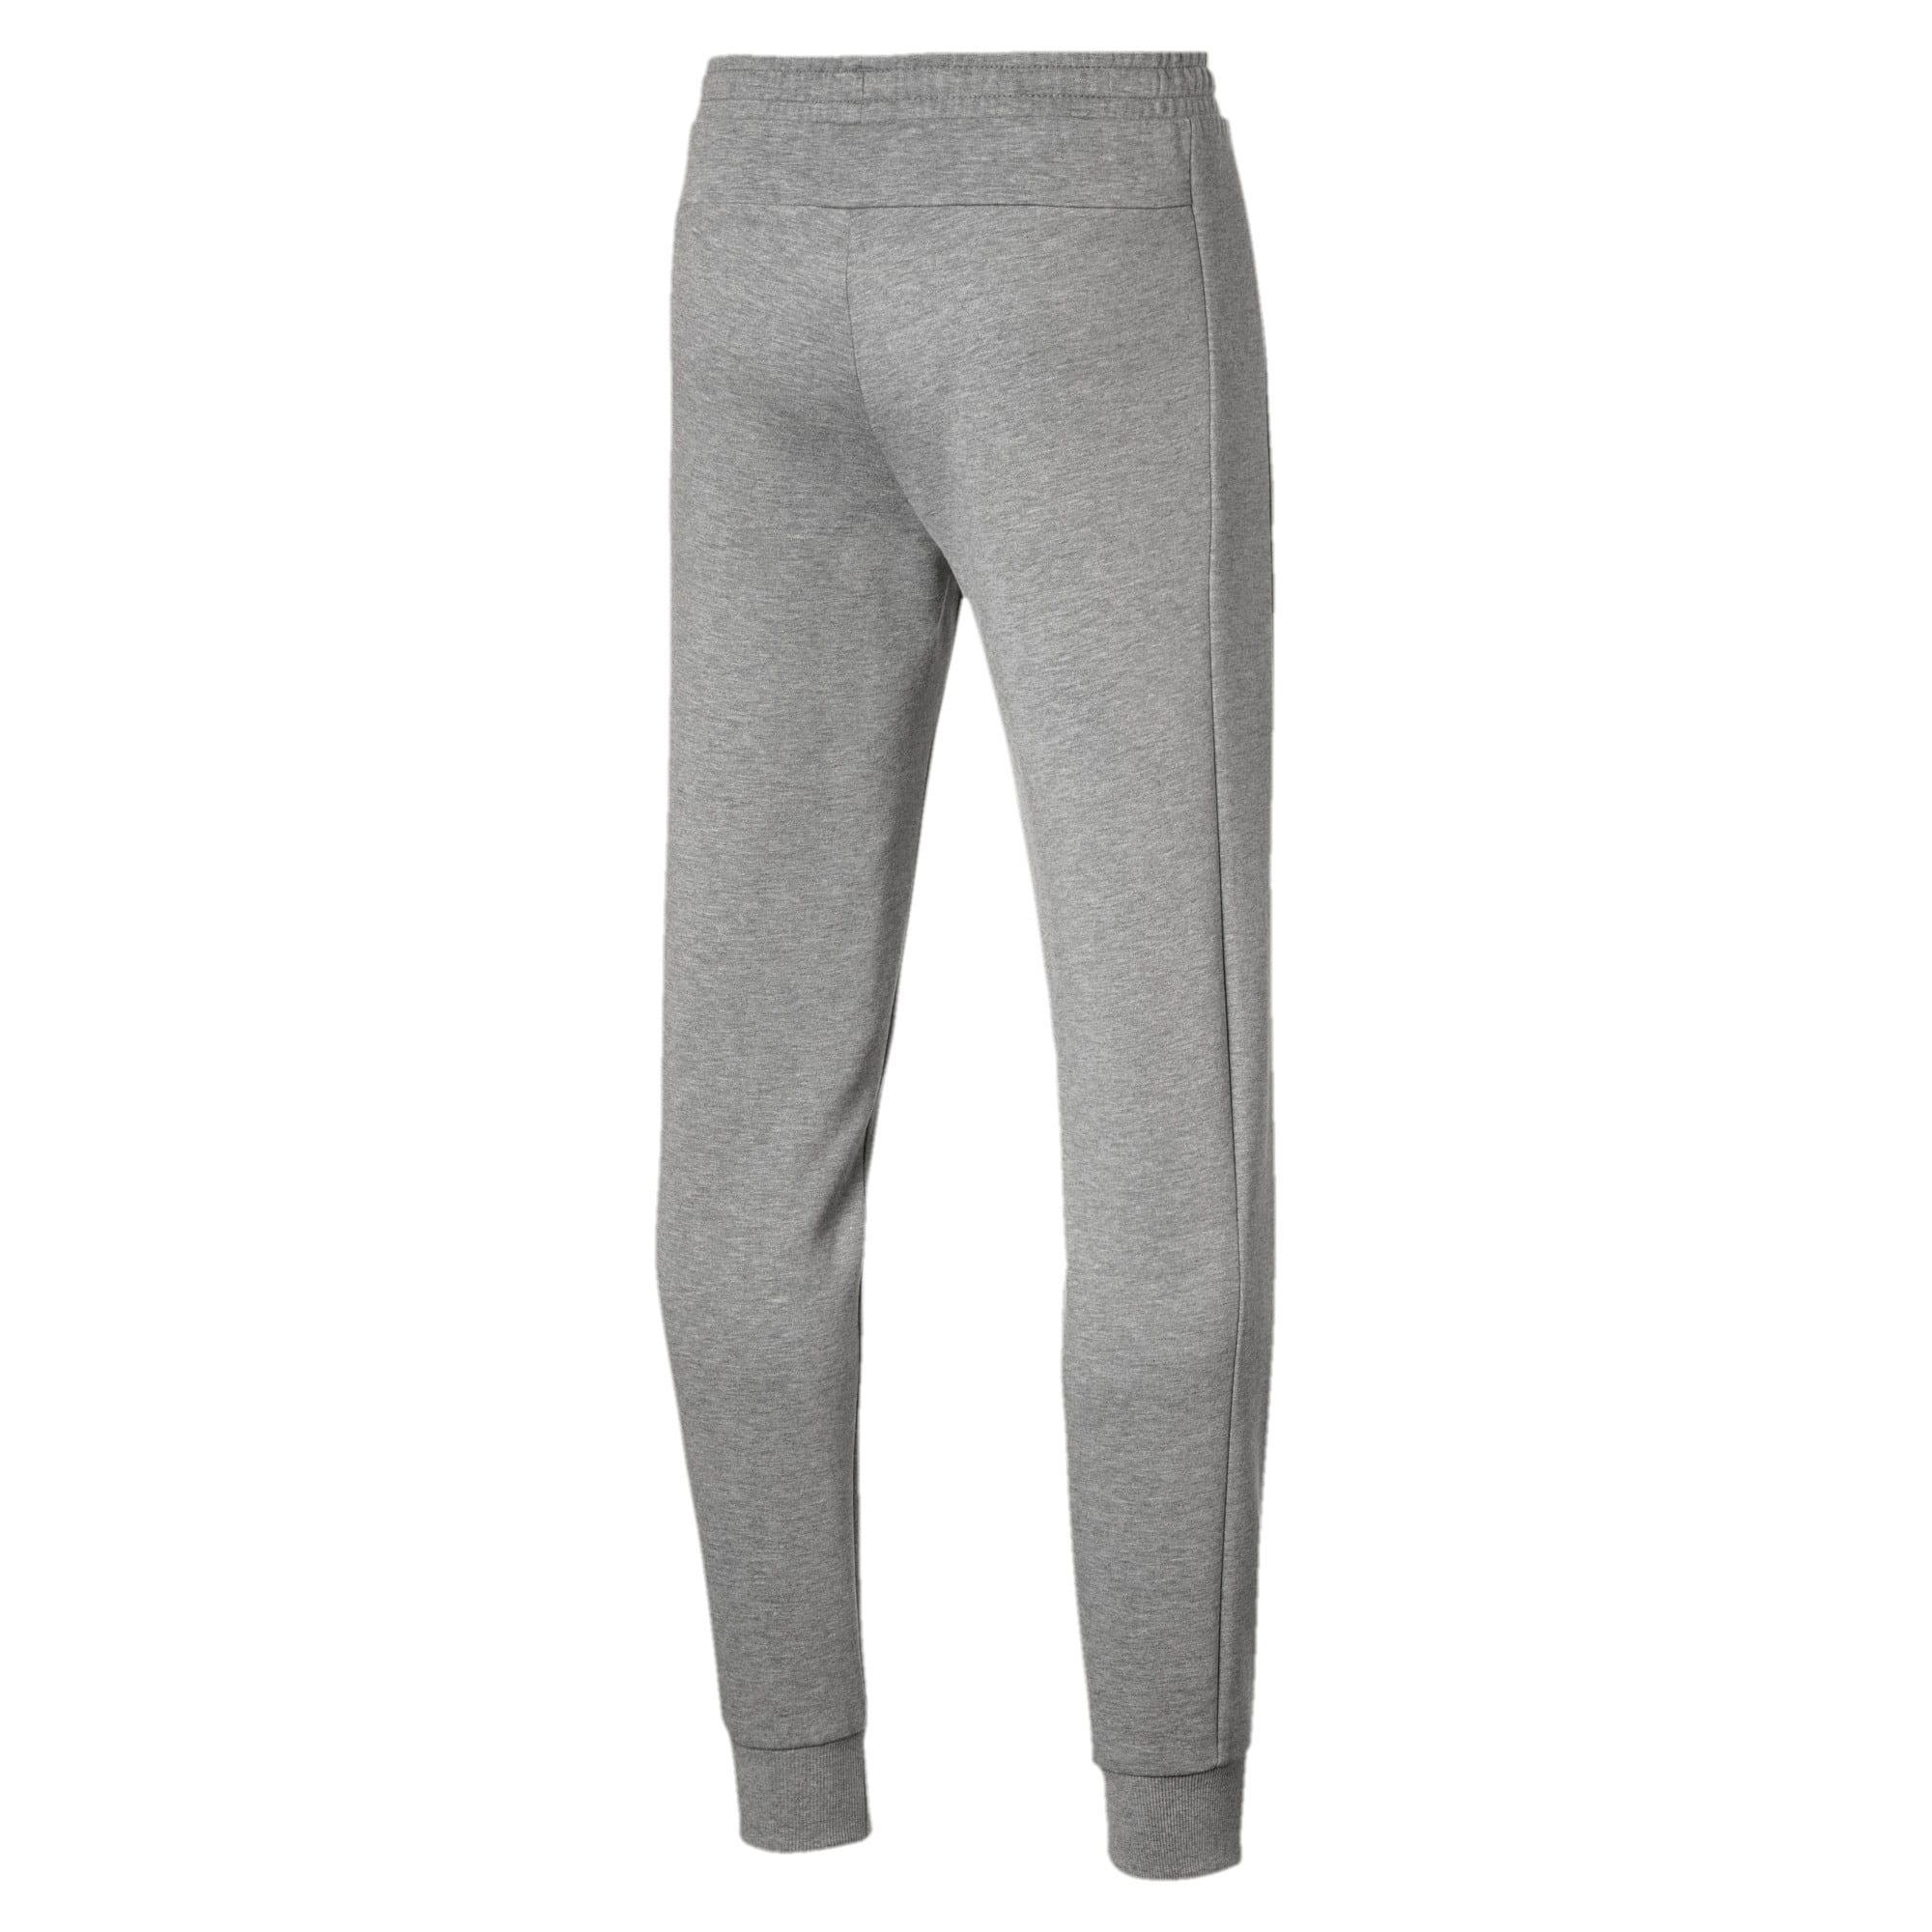 Thumbnail 2 of BMW M Motorsport Knitted Men's Sweatpants, Medium Gray Heather, medium